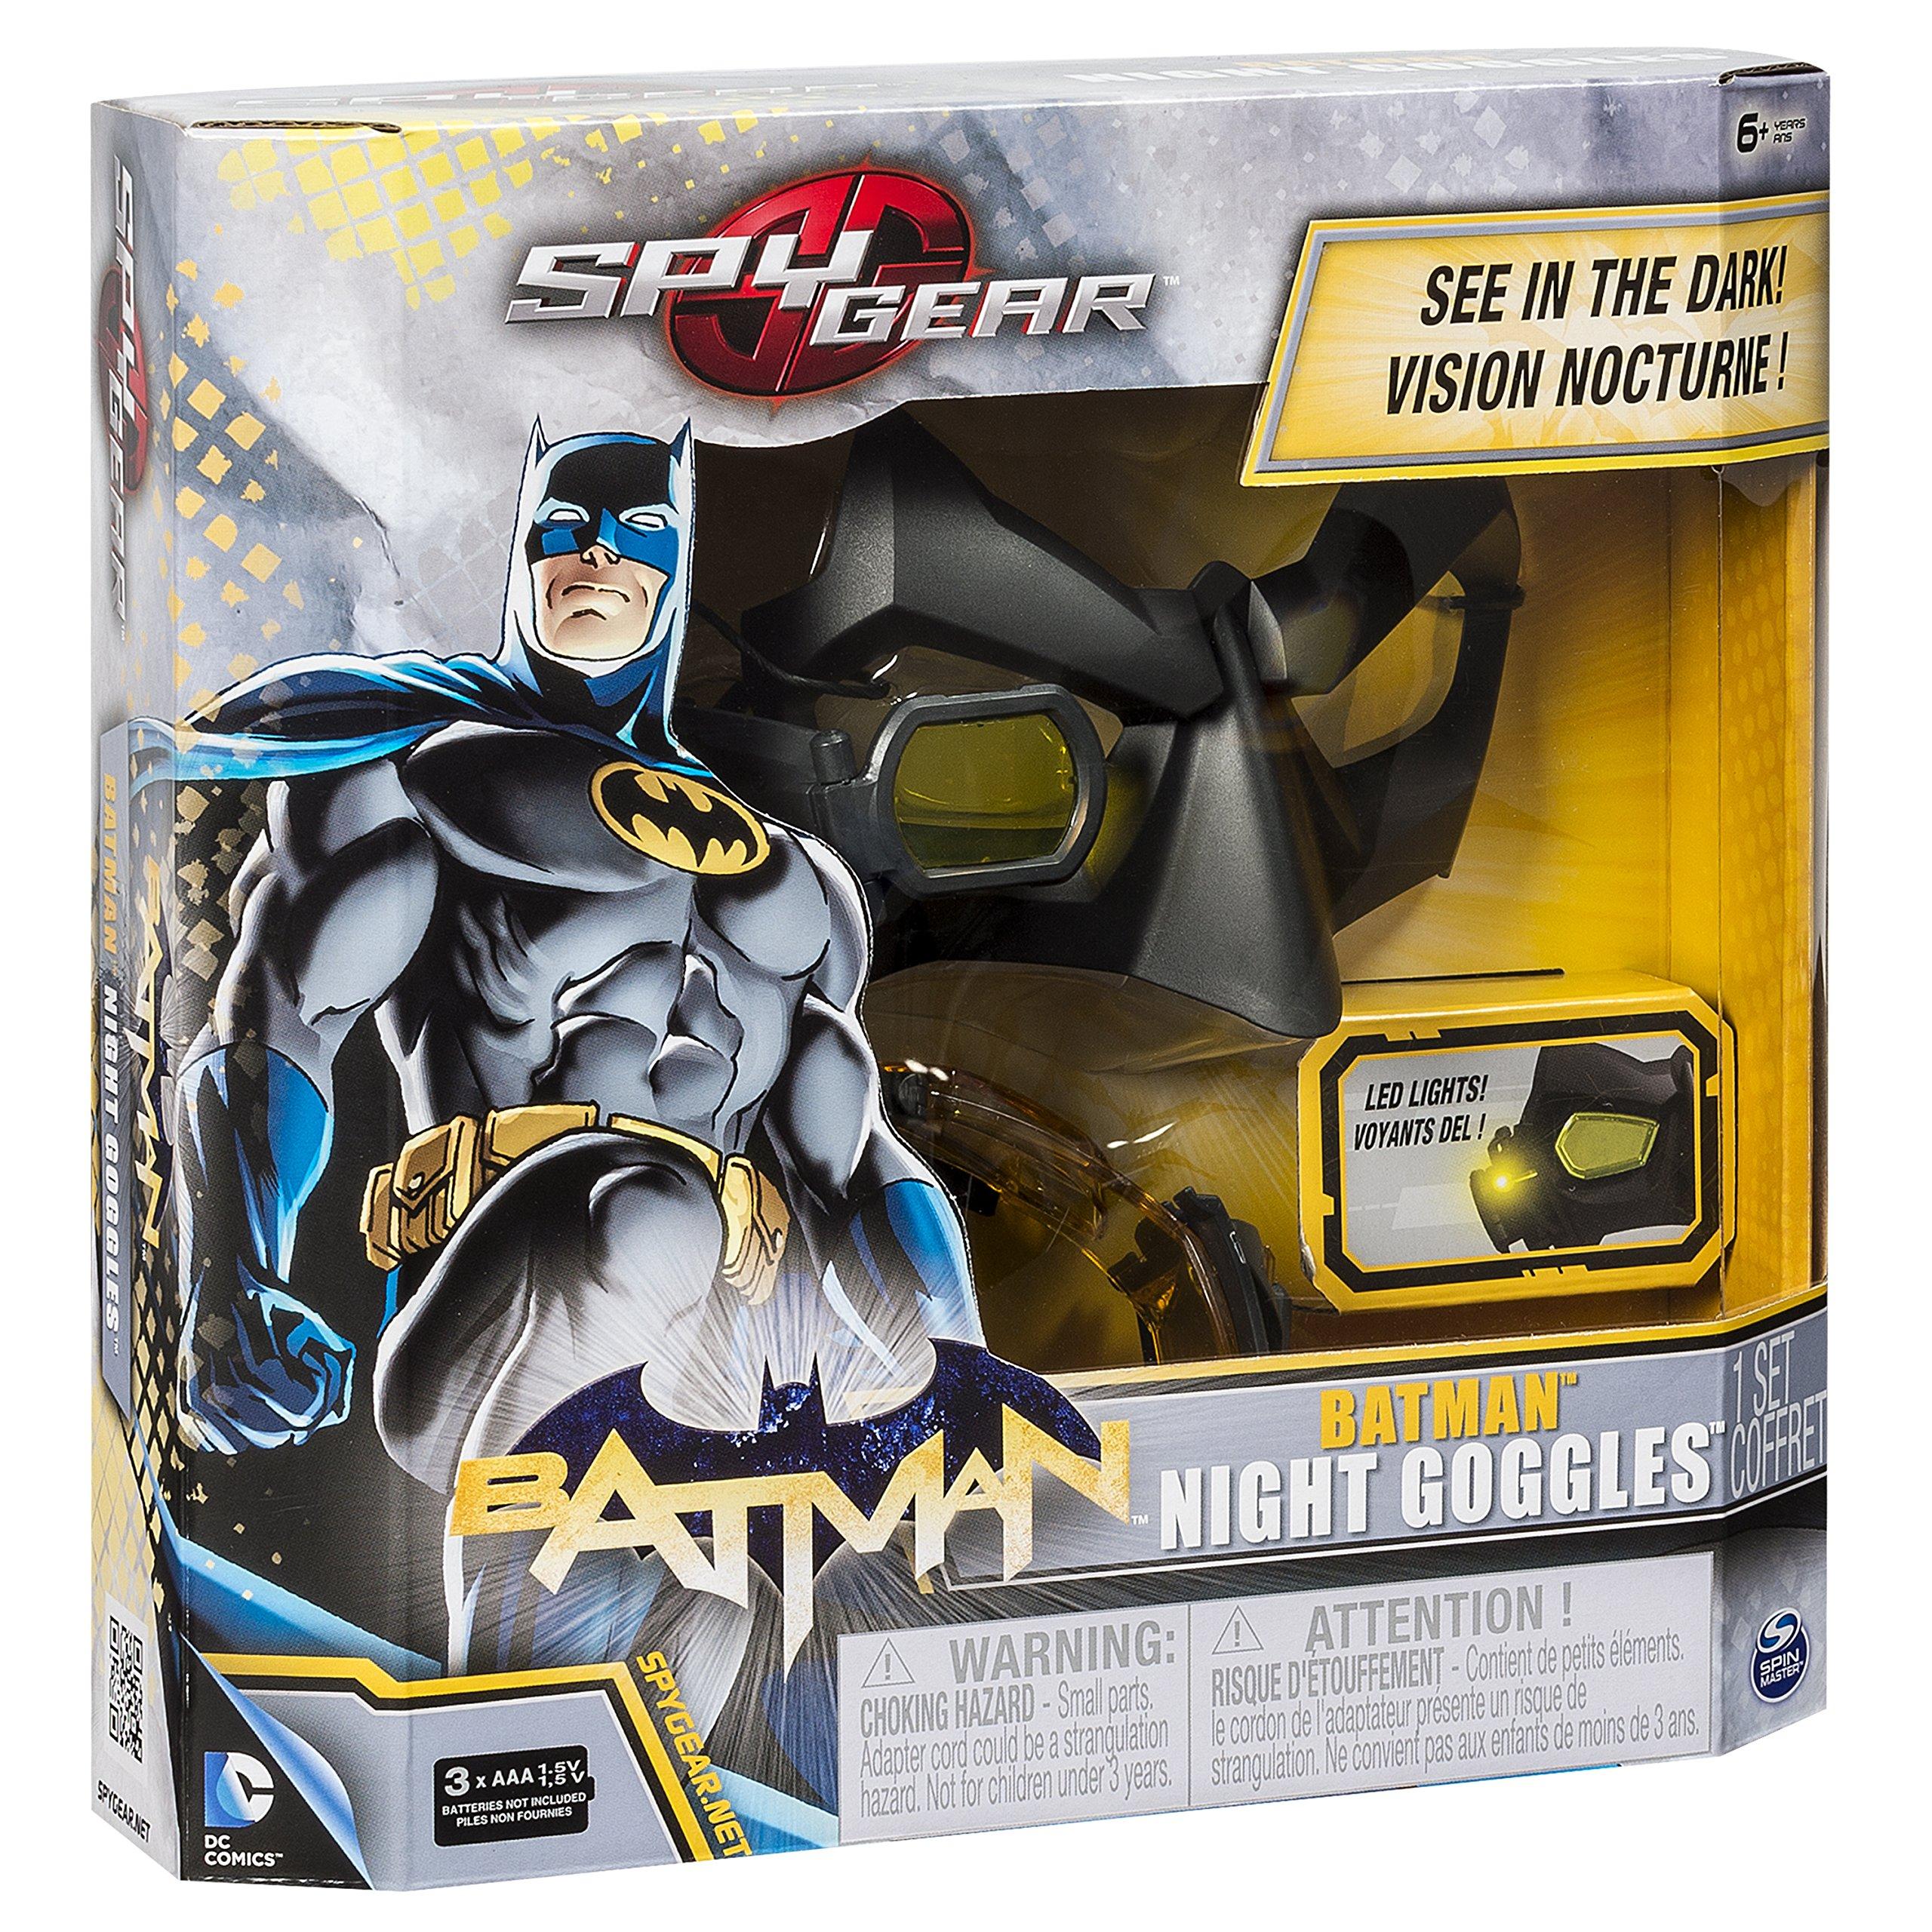 Spy Gear - Batman Night Goggles by Spy Gear (Image #7)